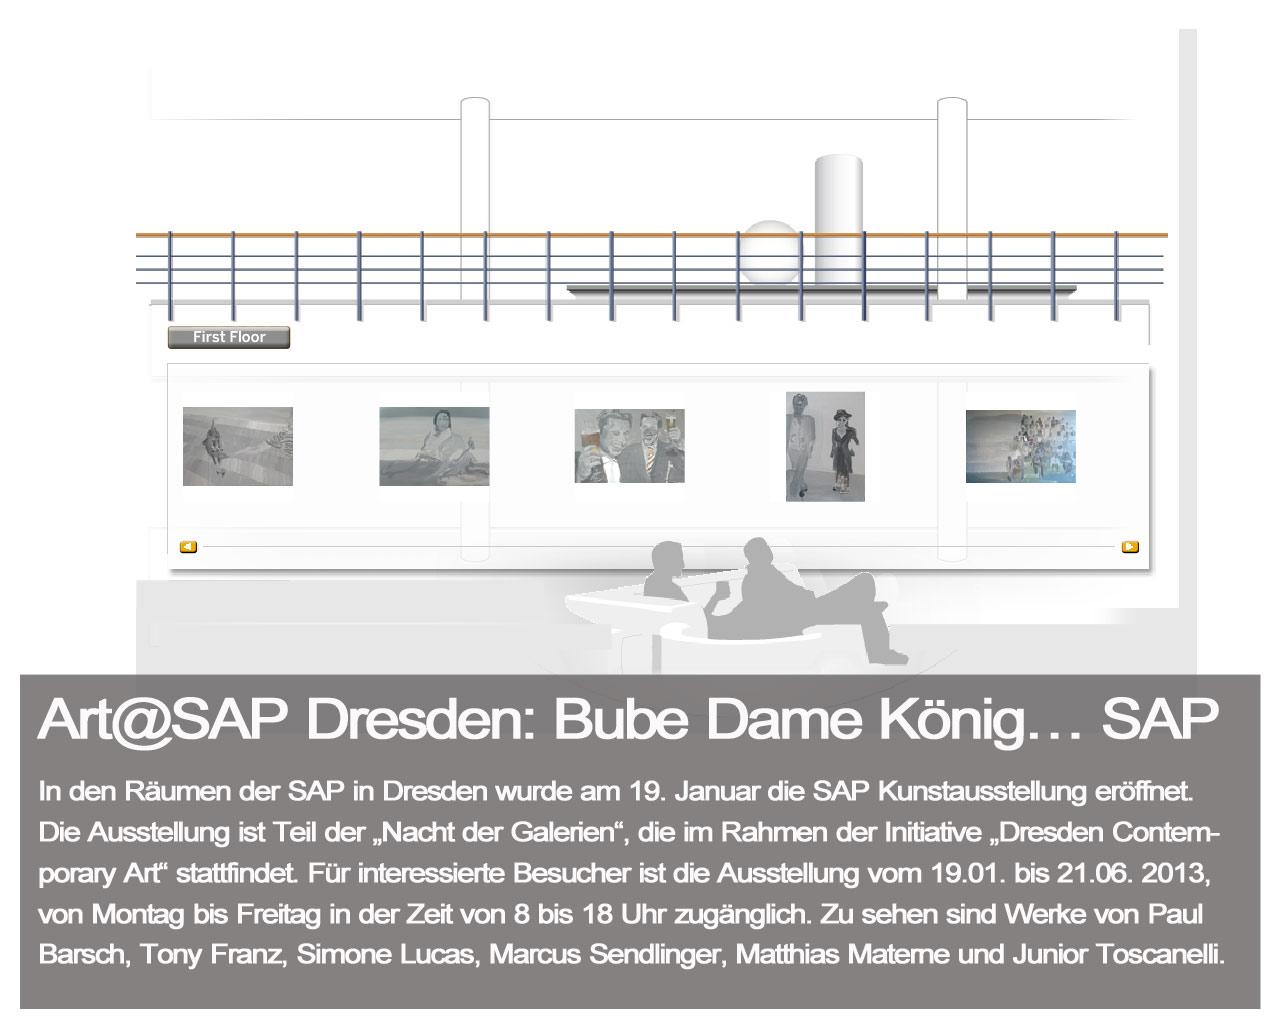 Art and SAP-Dresden-Bube-Dame-König SAP